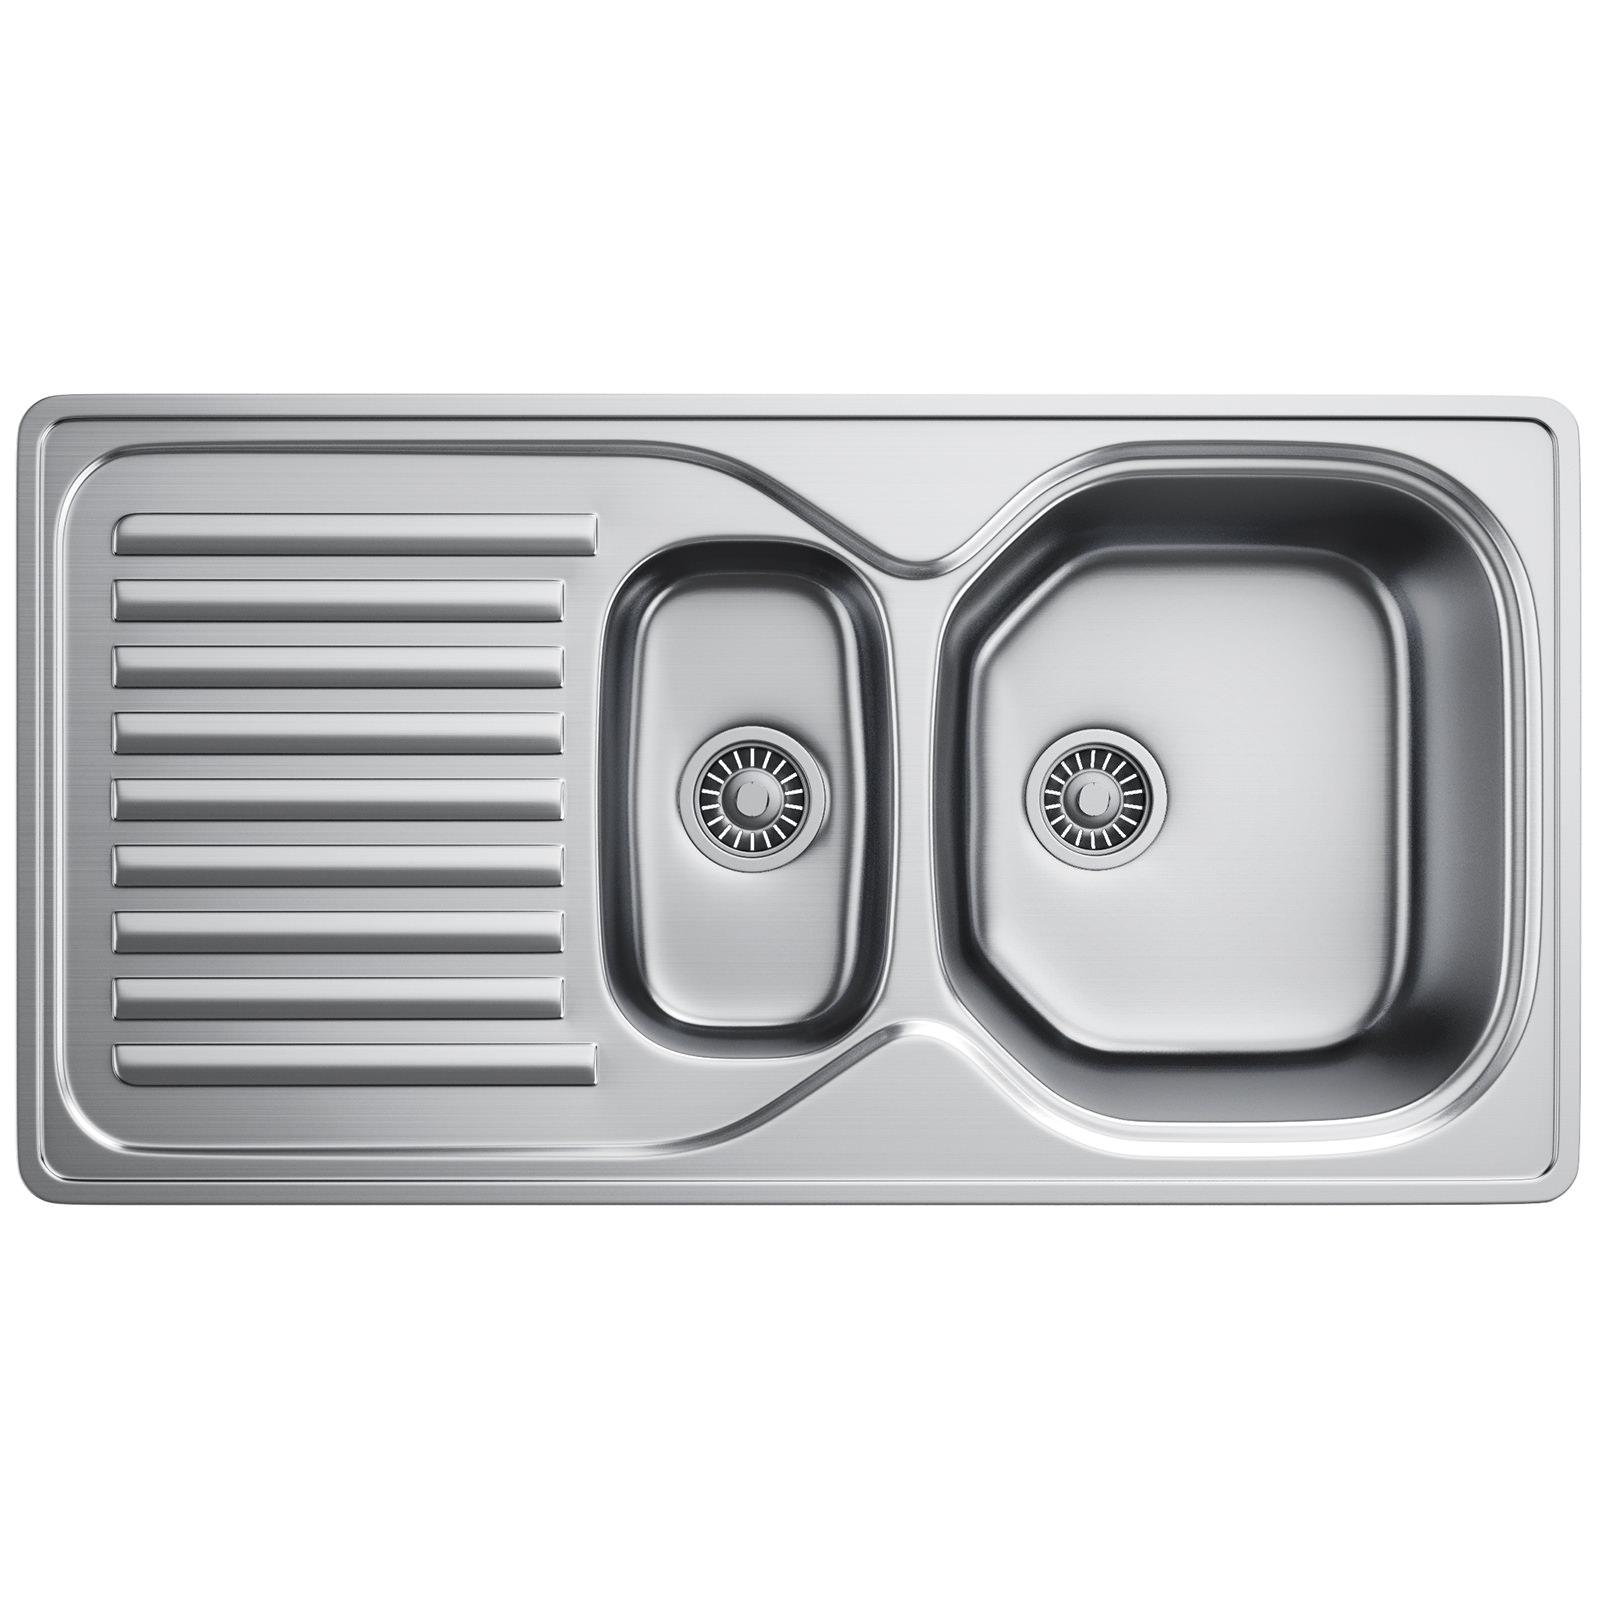 Franke 651 Sink : Franke Elba ELN 651 Stainless Steel 1.5 Bowl Inset Kitchen Sink ...